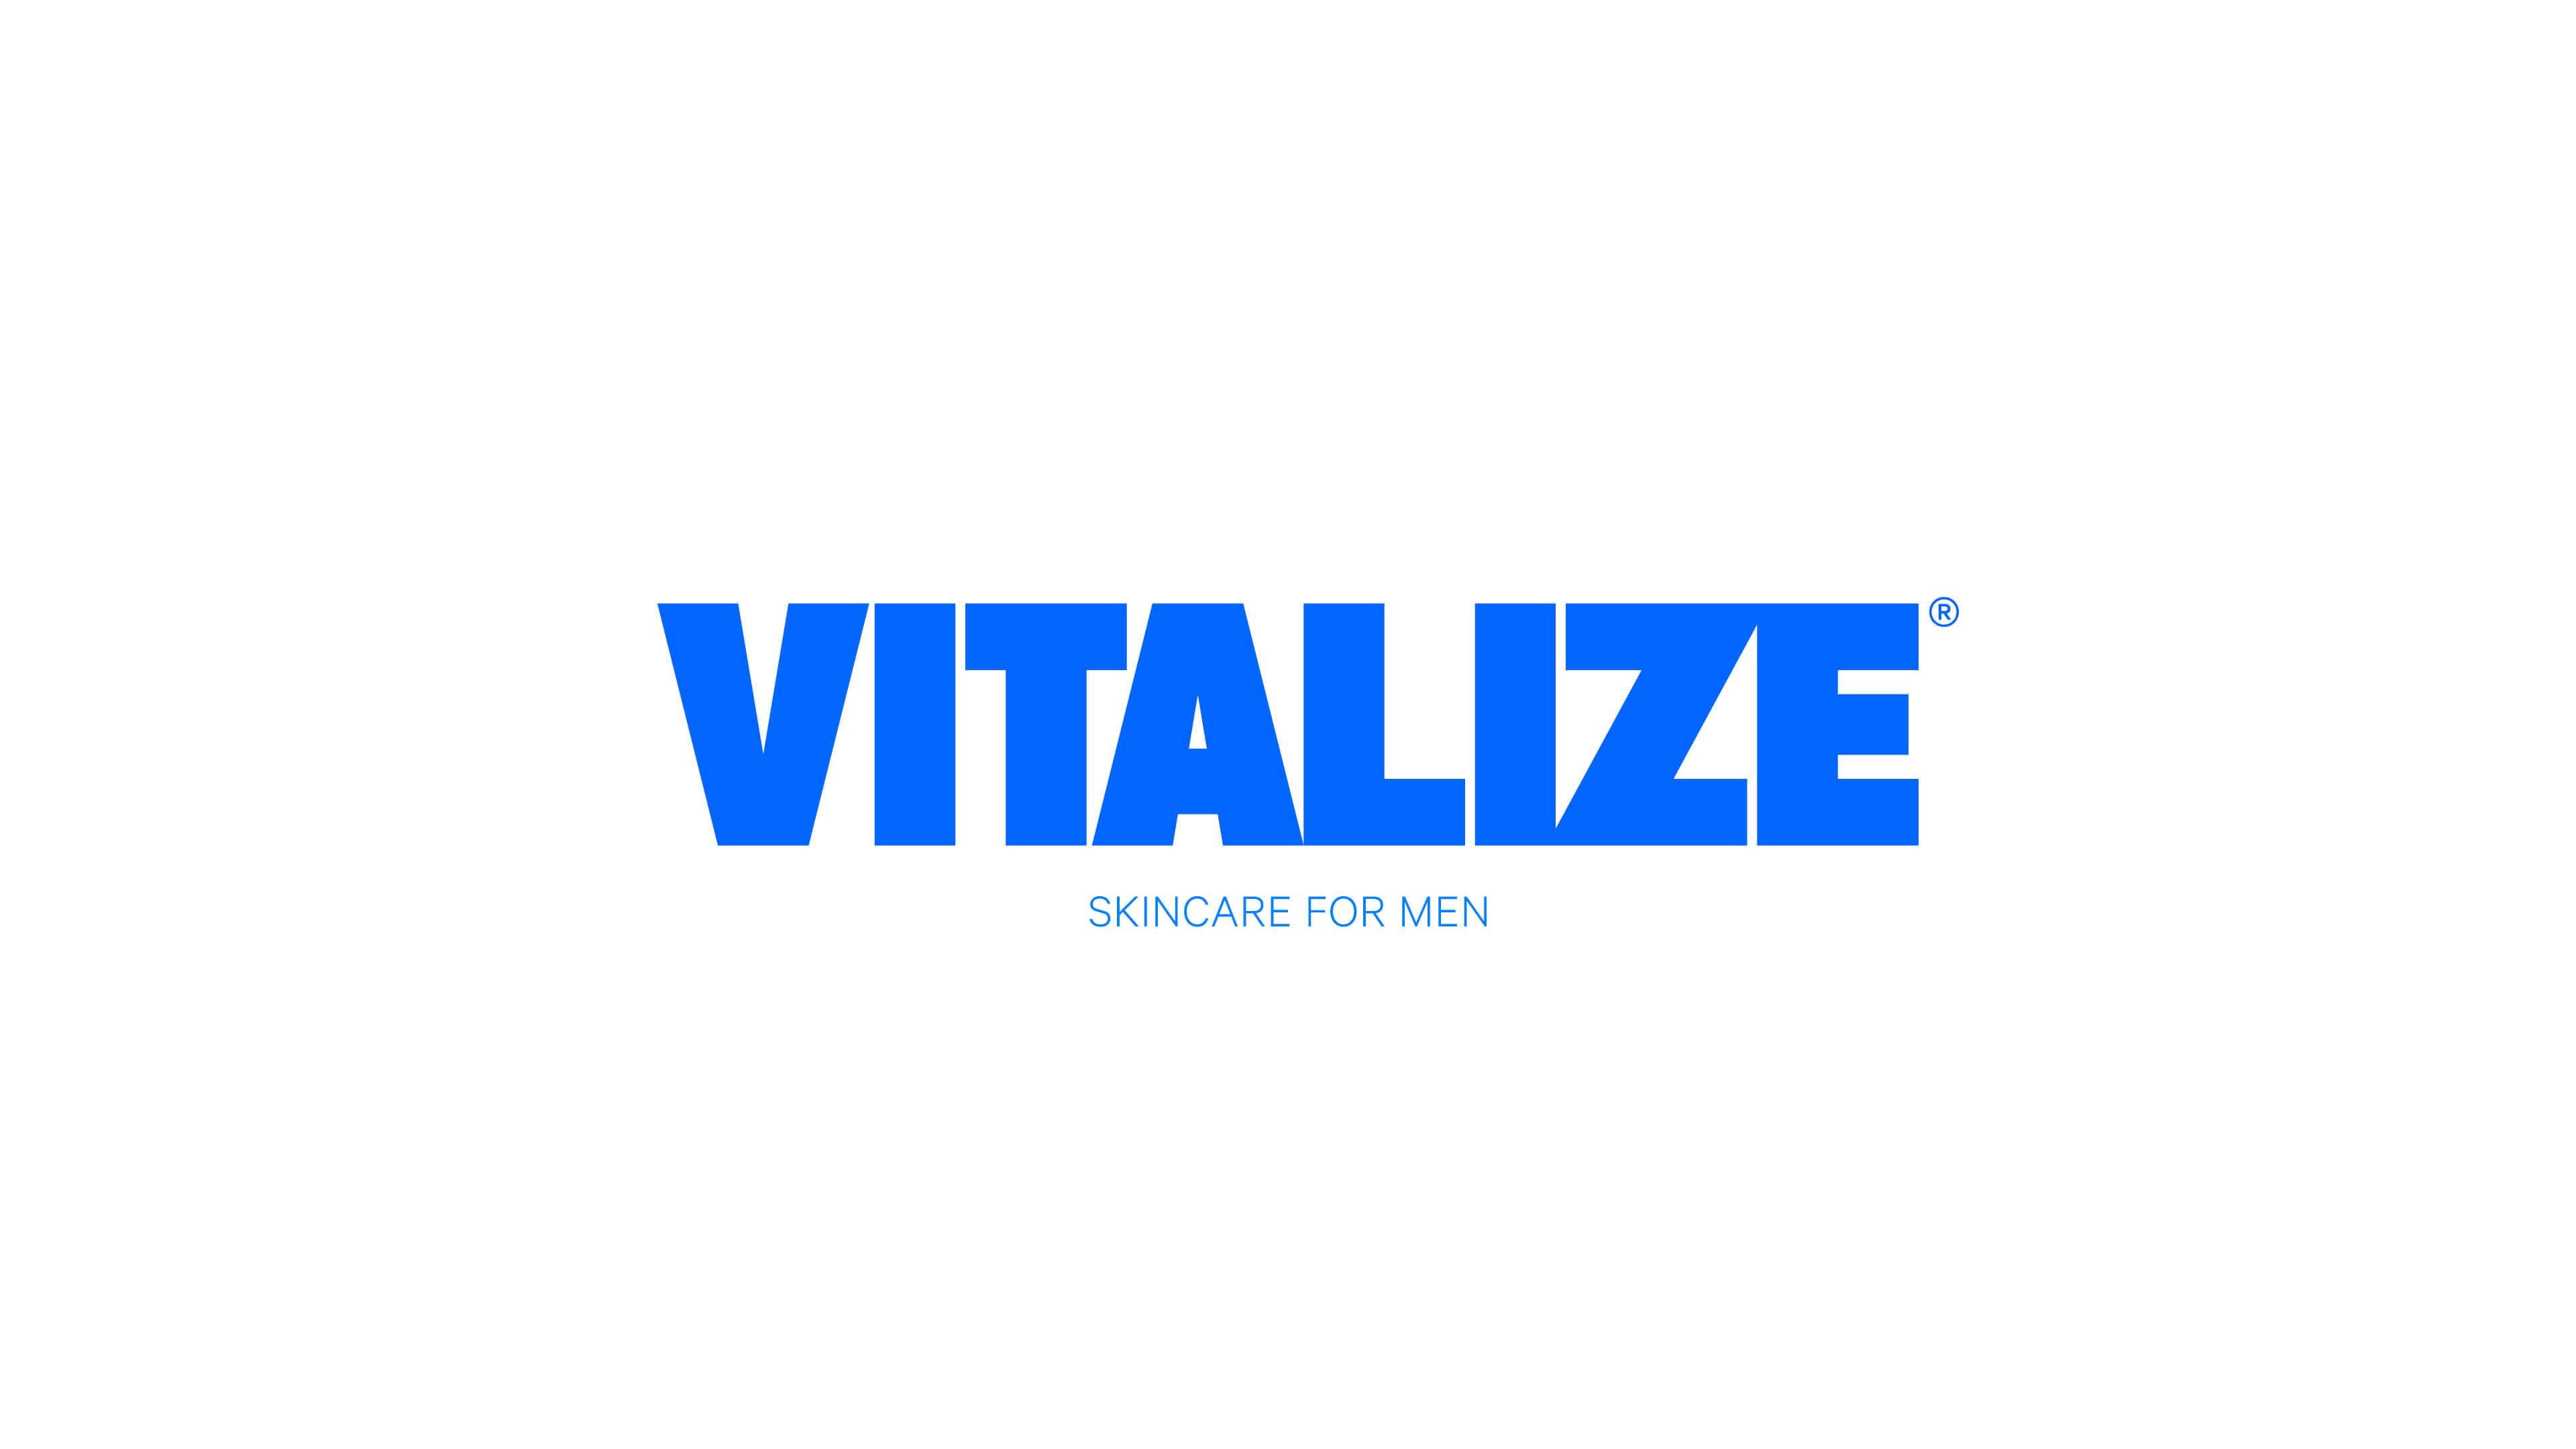 vitalize_001-new3